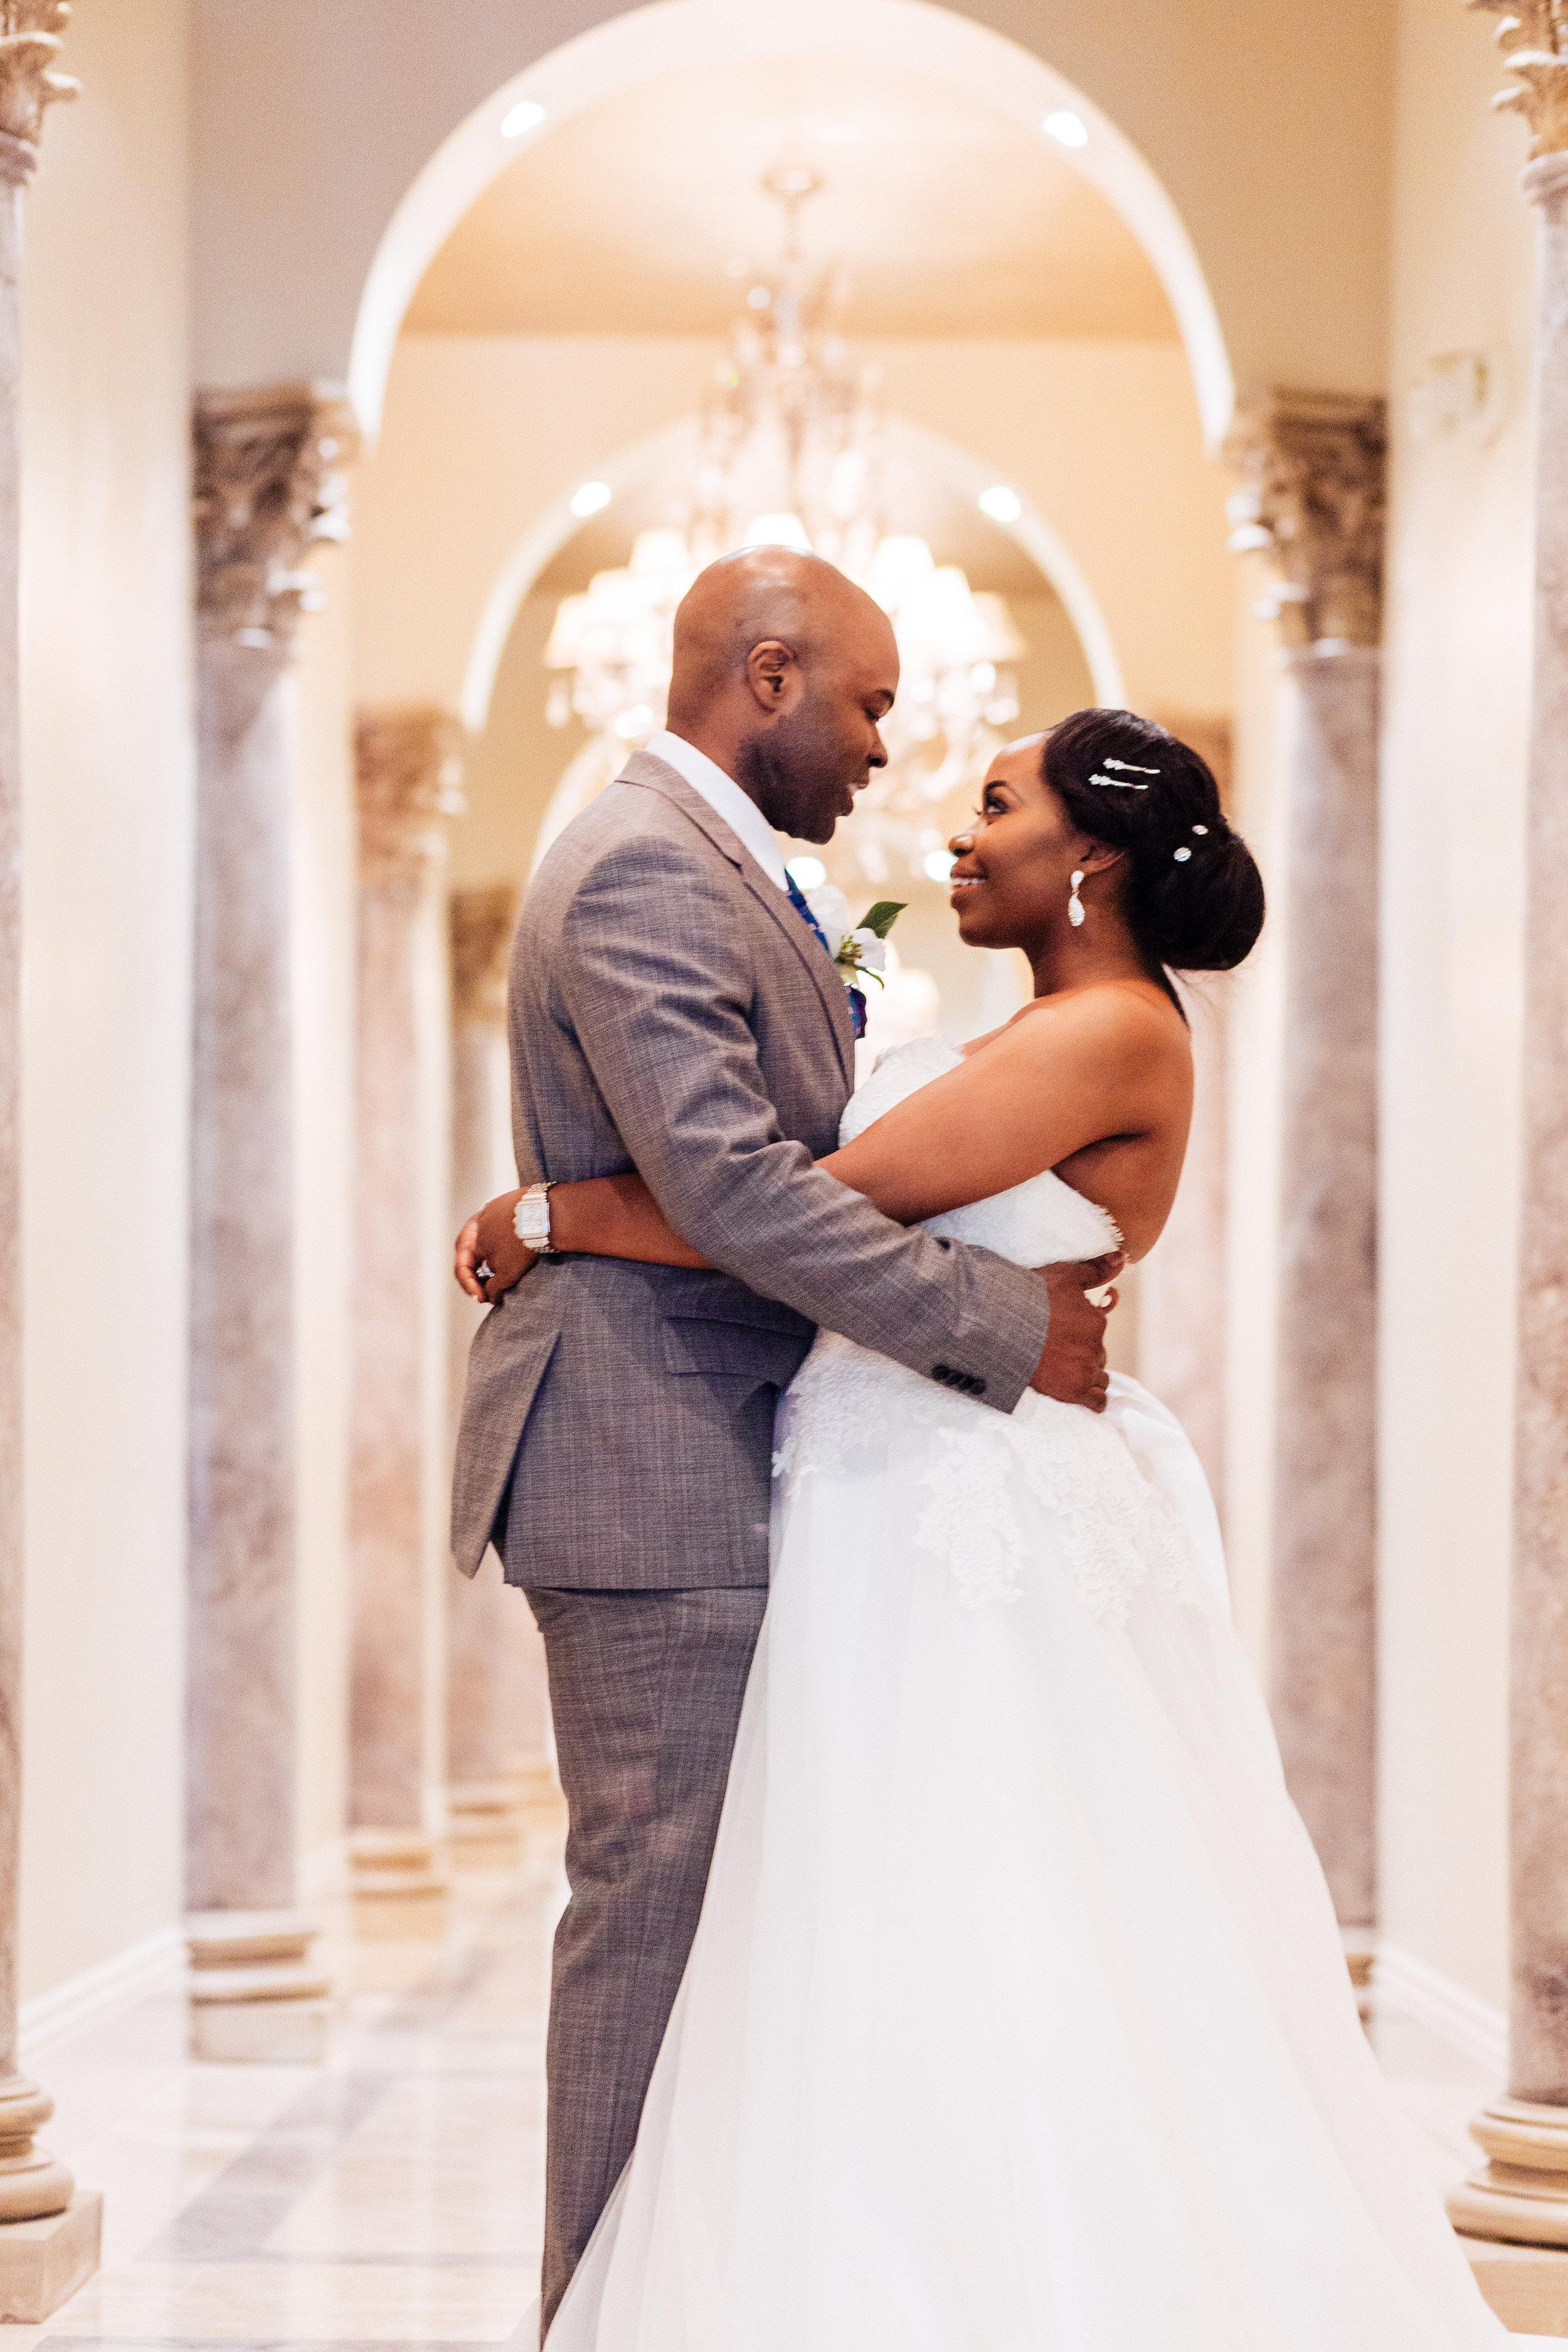 Monica.Justesen.Photography.05.16.Philadelphia.Wedding.4.jpg